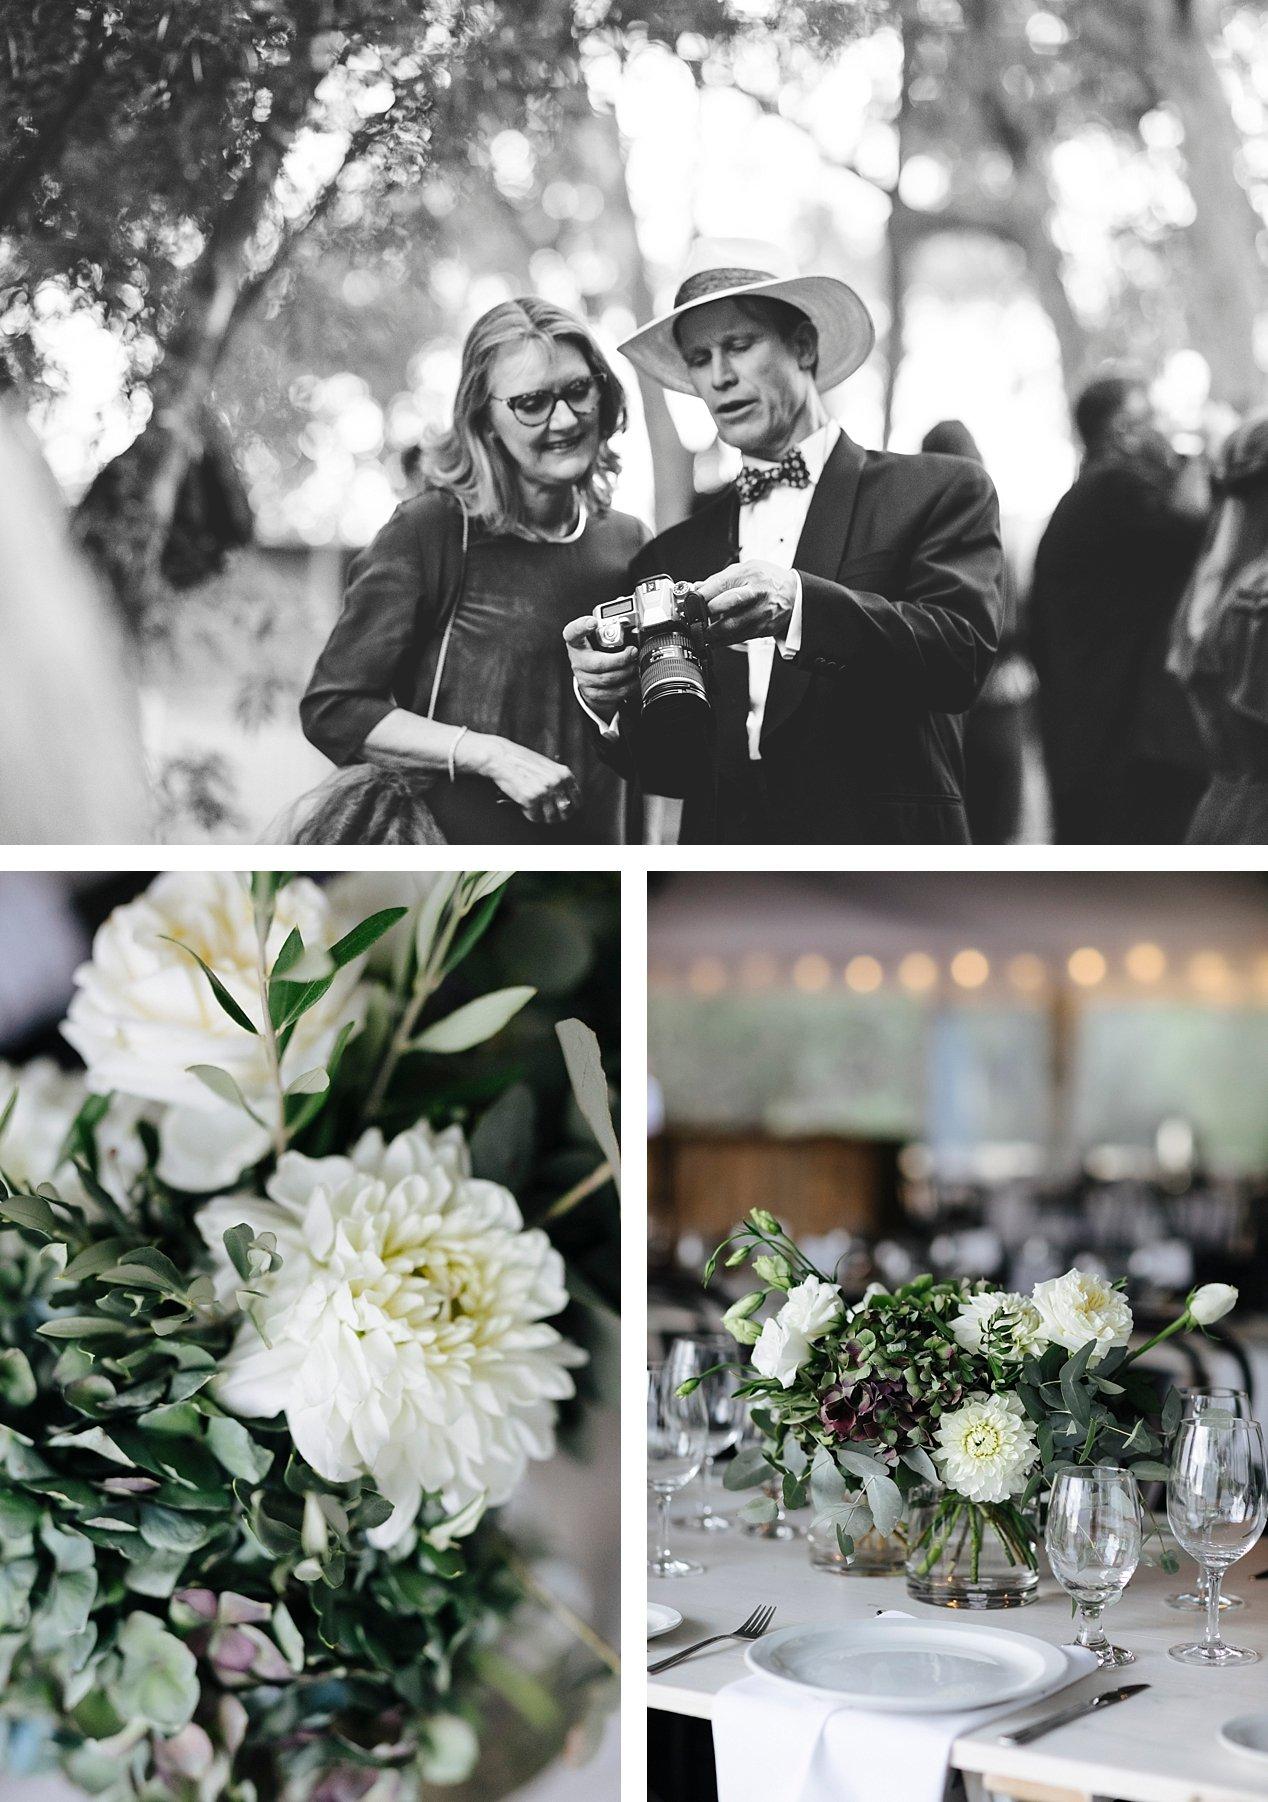 Jerilderie Wedding by Wagga Wagga Wedding Photographer Peppermint Studios_Deniliquin weddings_0091